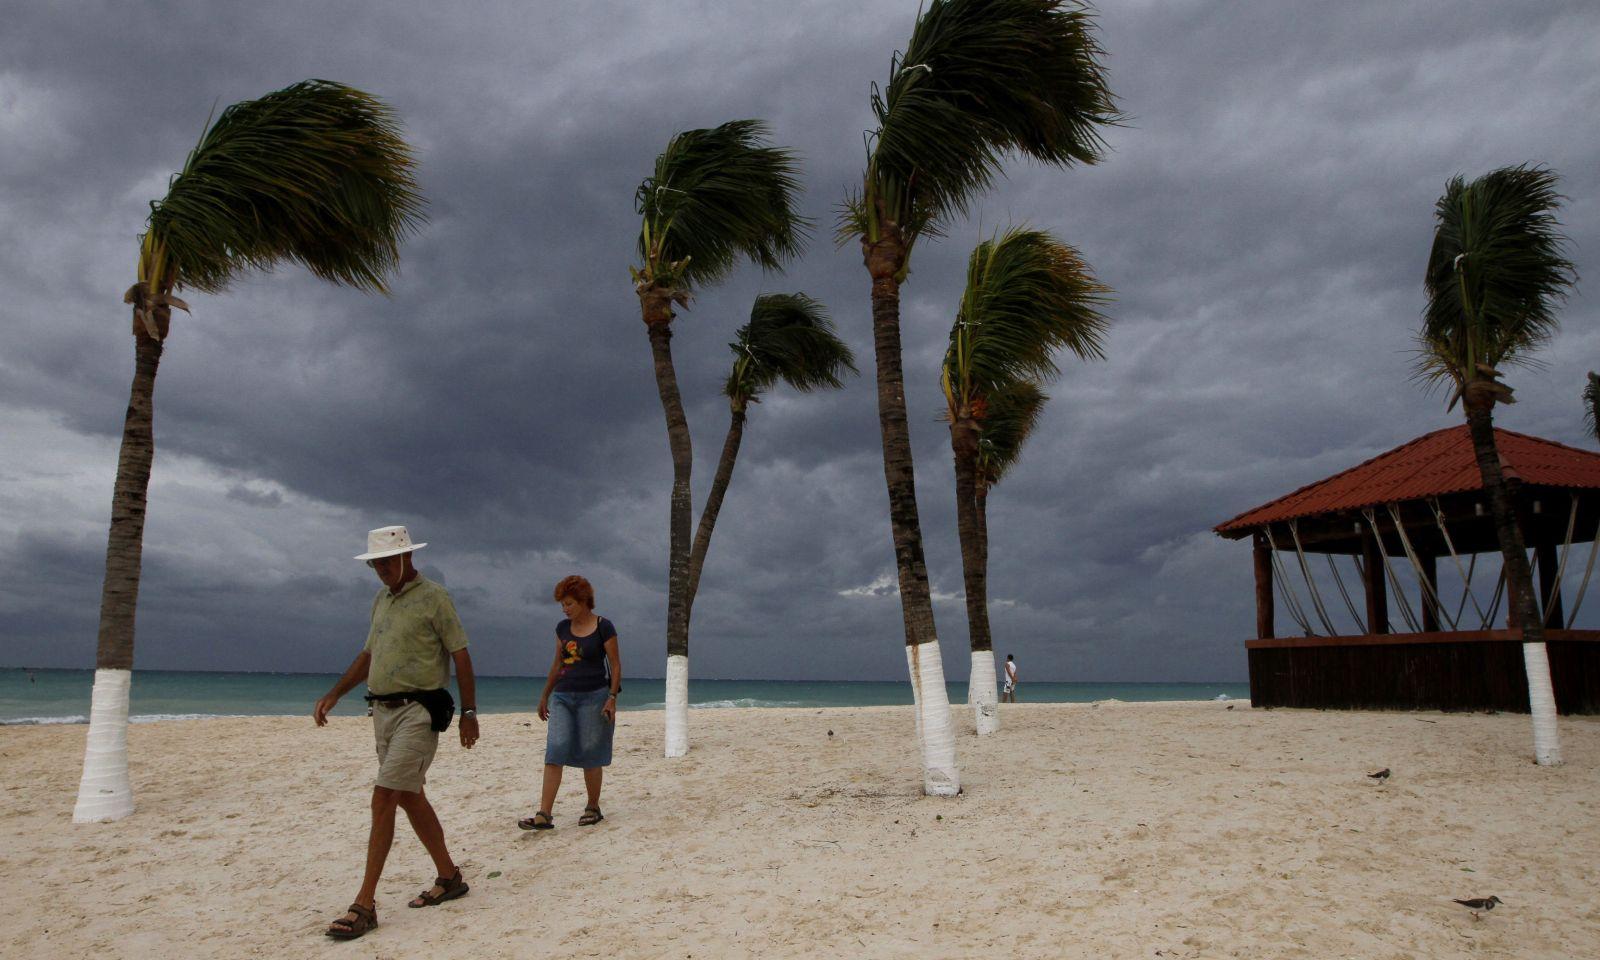 Amenaza de tormenta tropical en la Costa   El Imparcial de Oaxaca